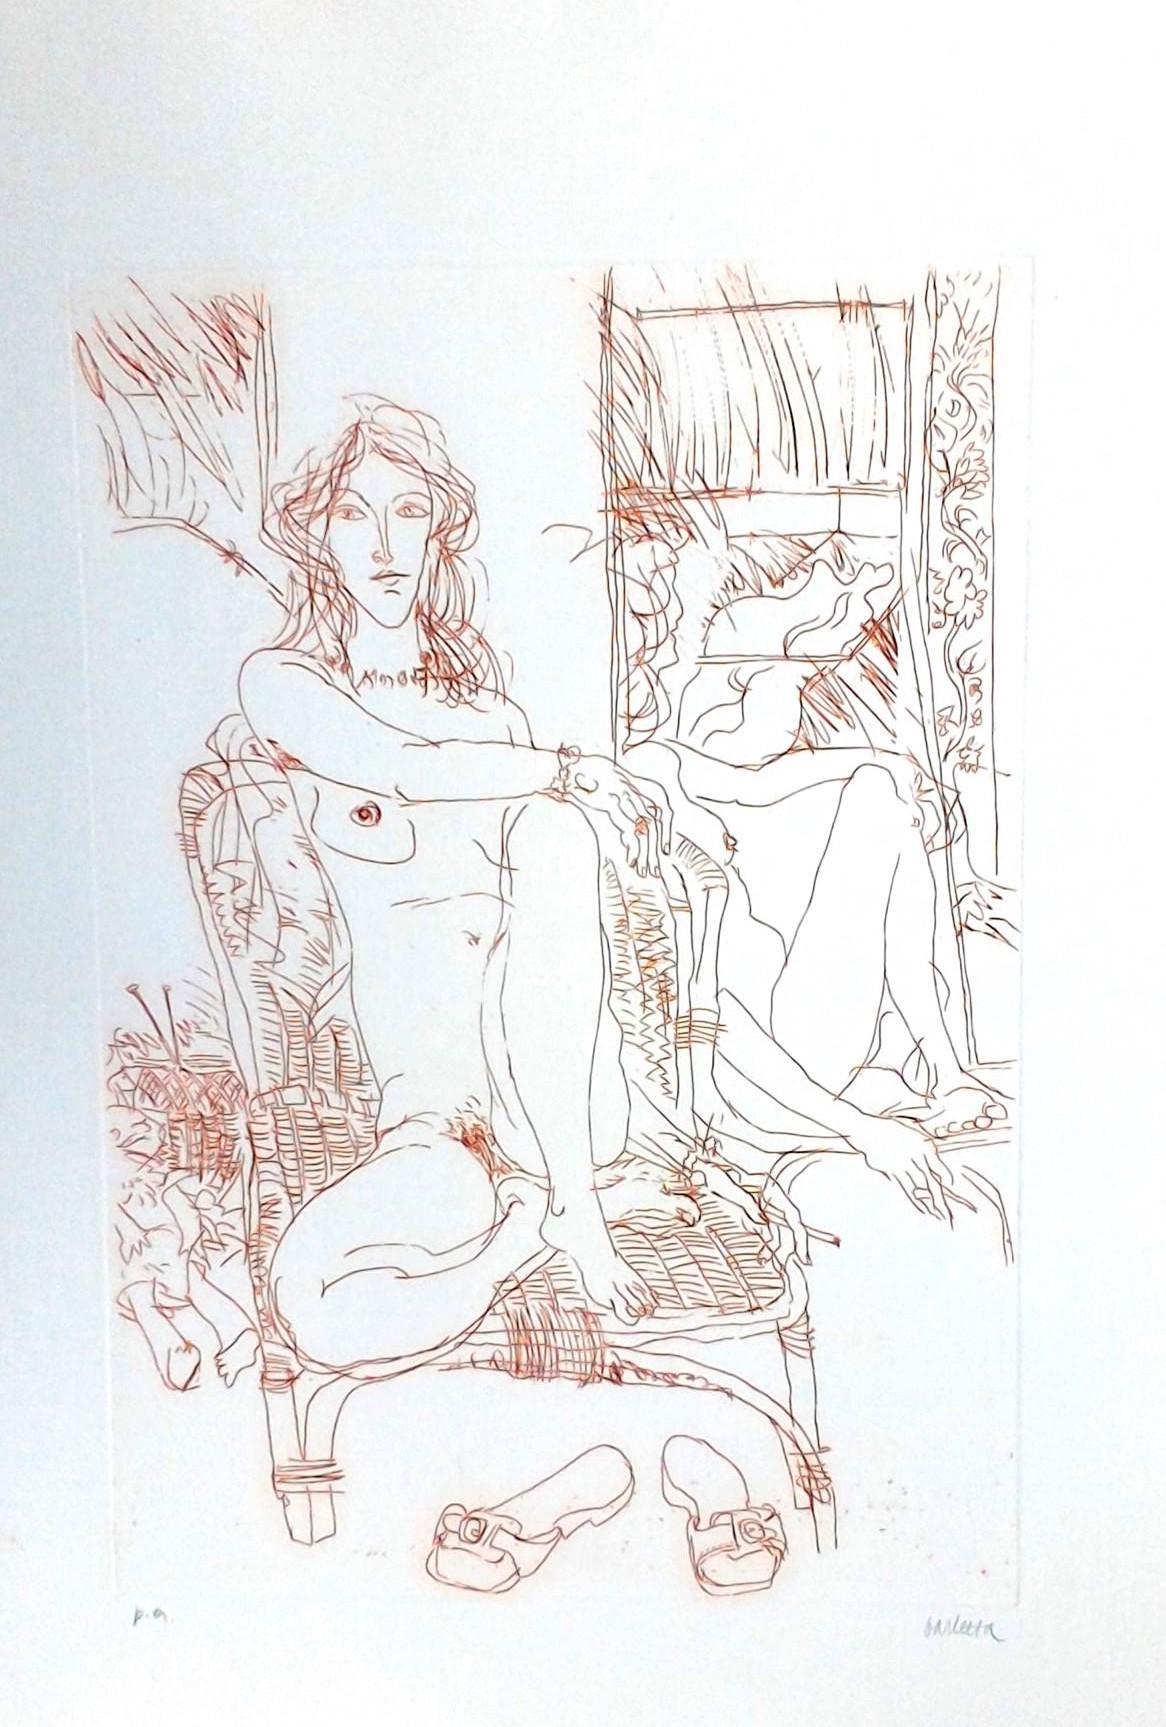 Nude Model - Original Etching by Sergio Barletta - 1970s